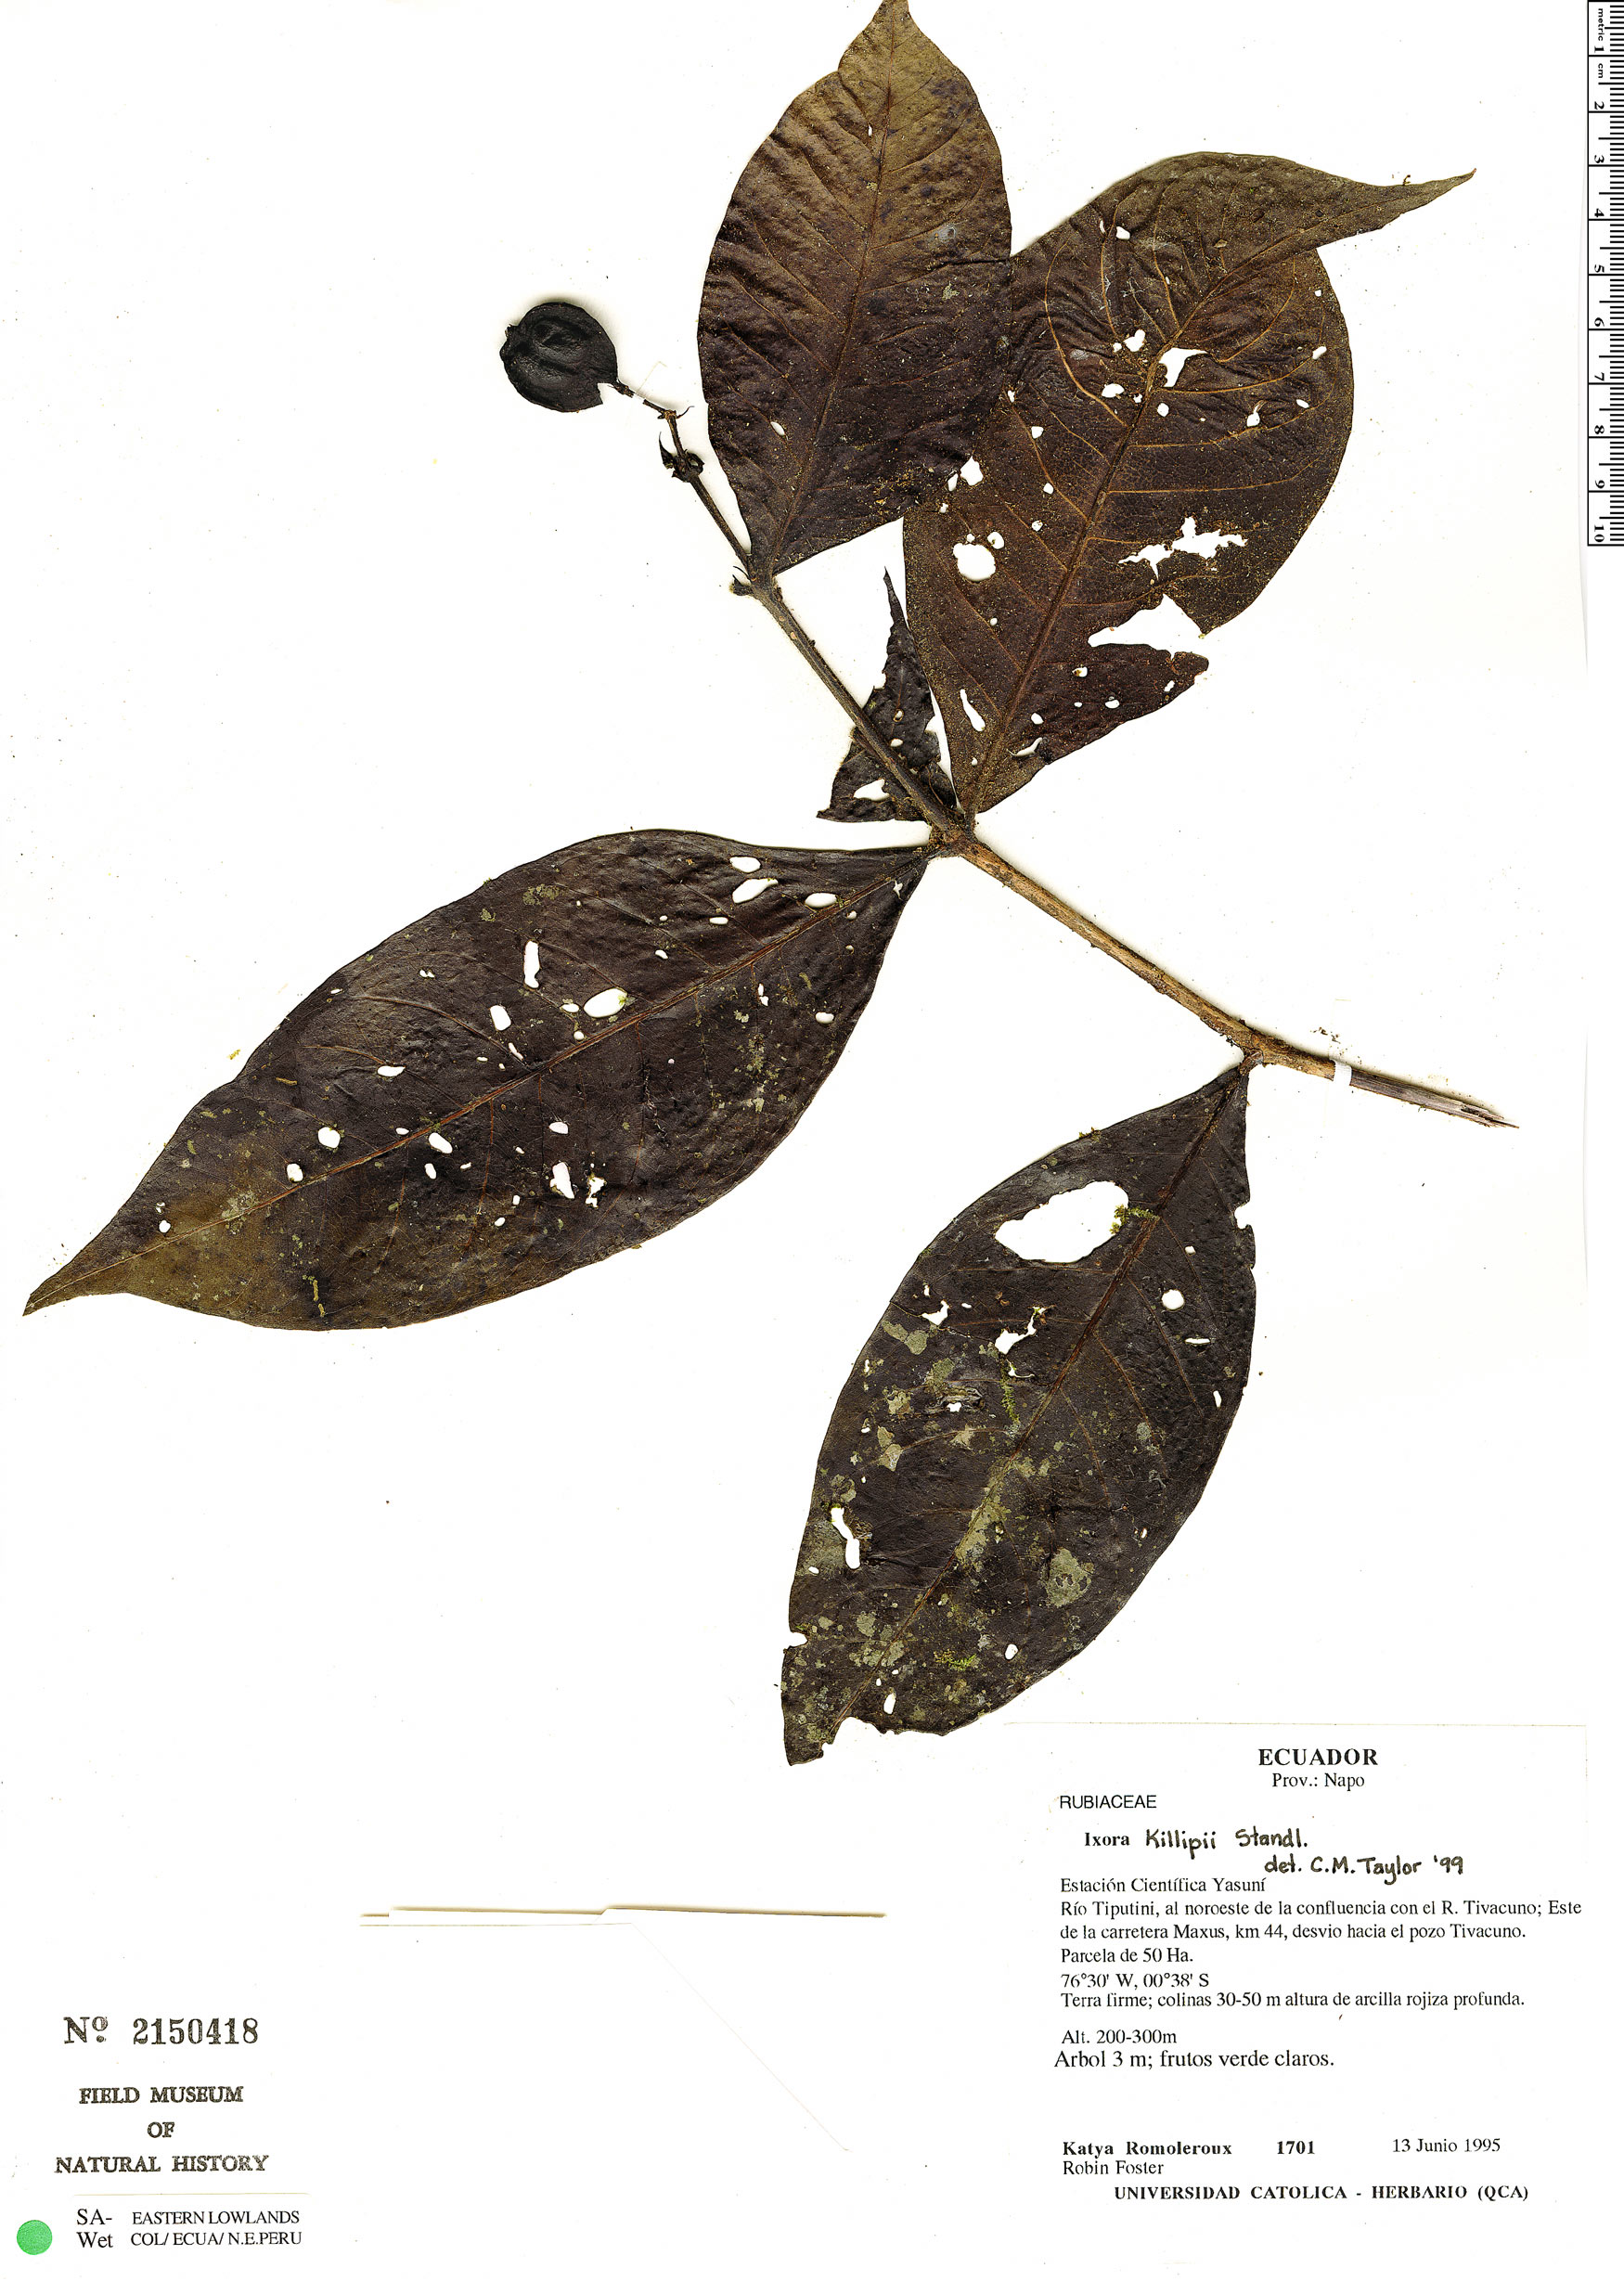 Espécime: Ixora killipii